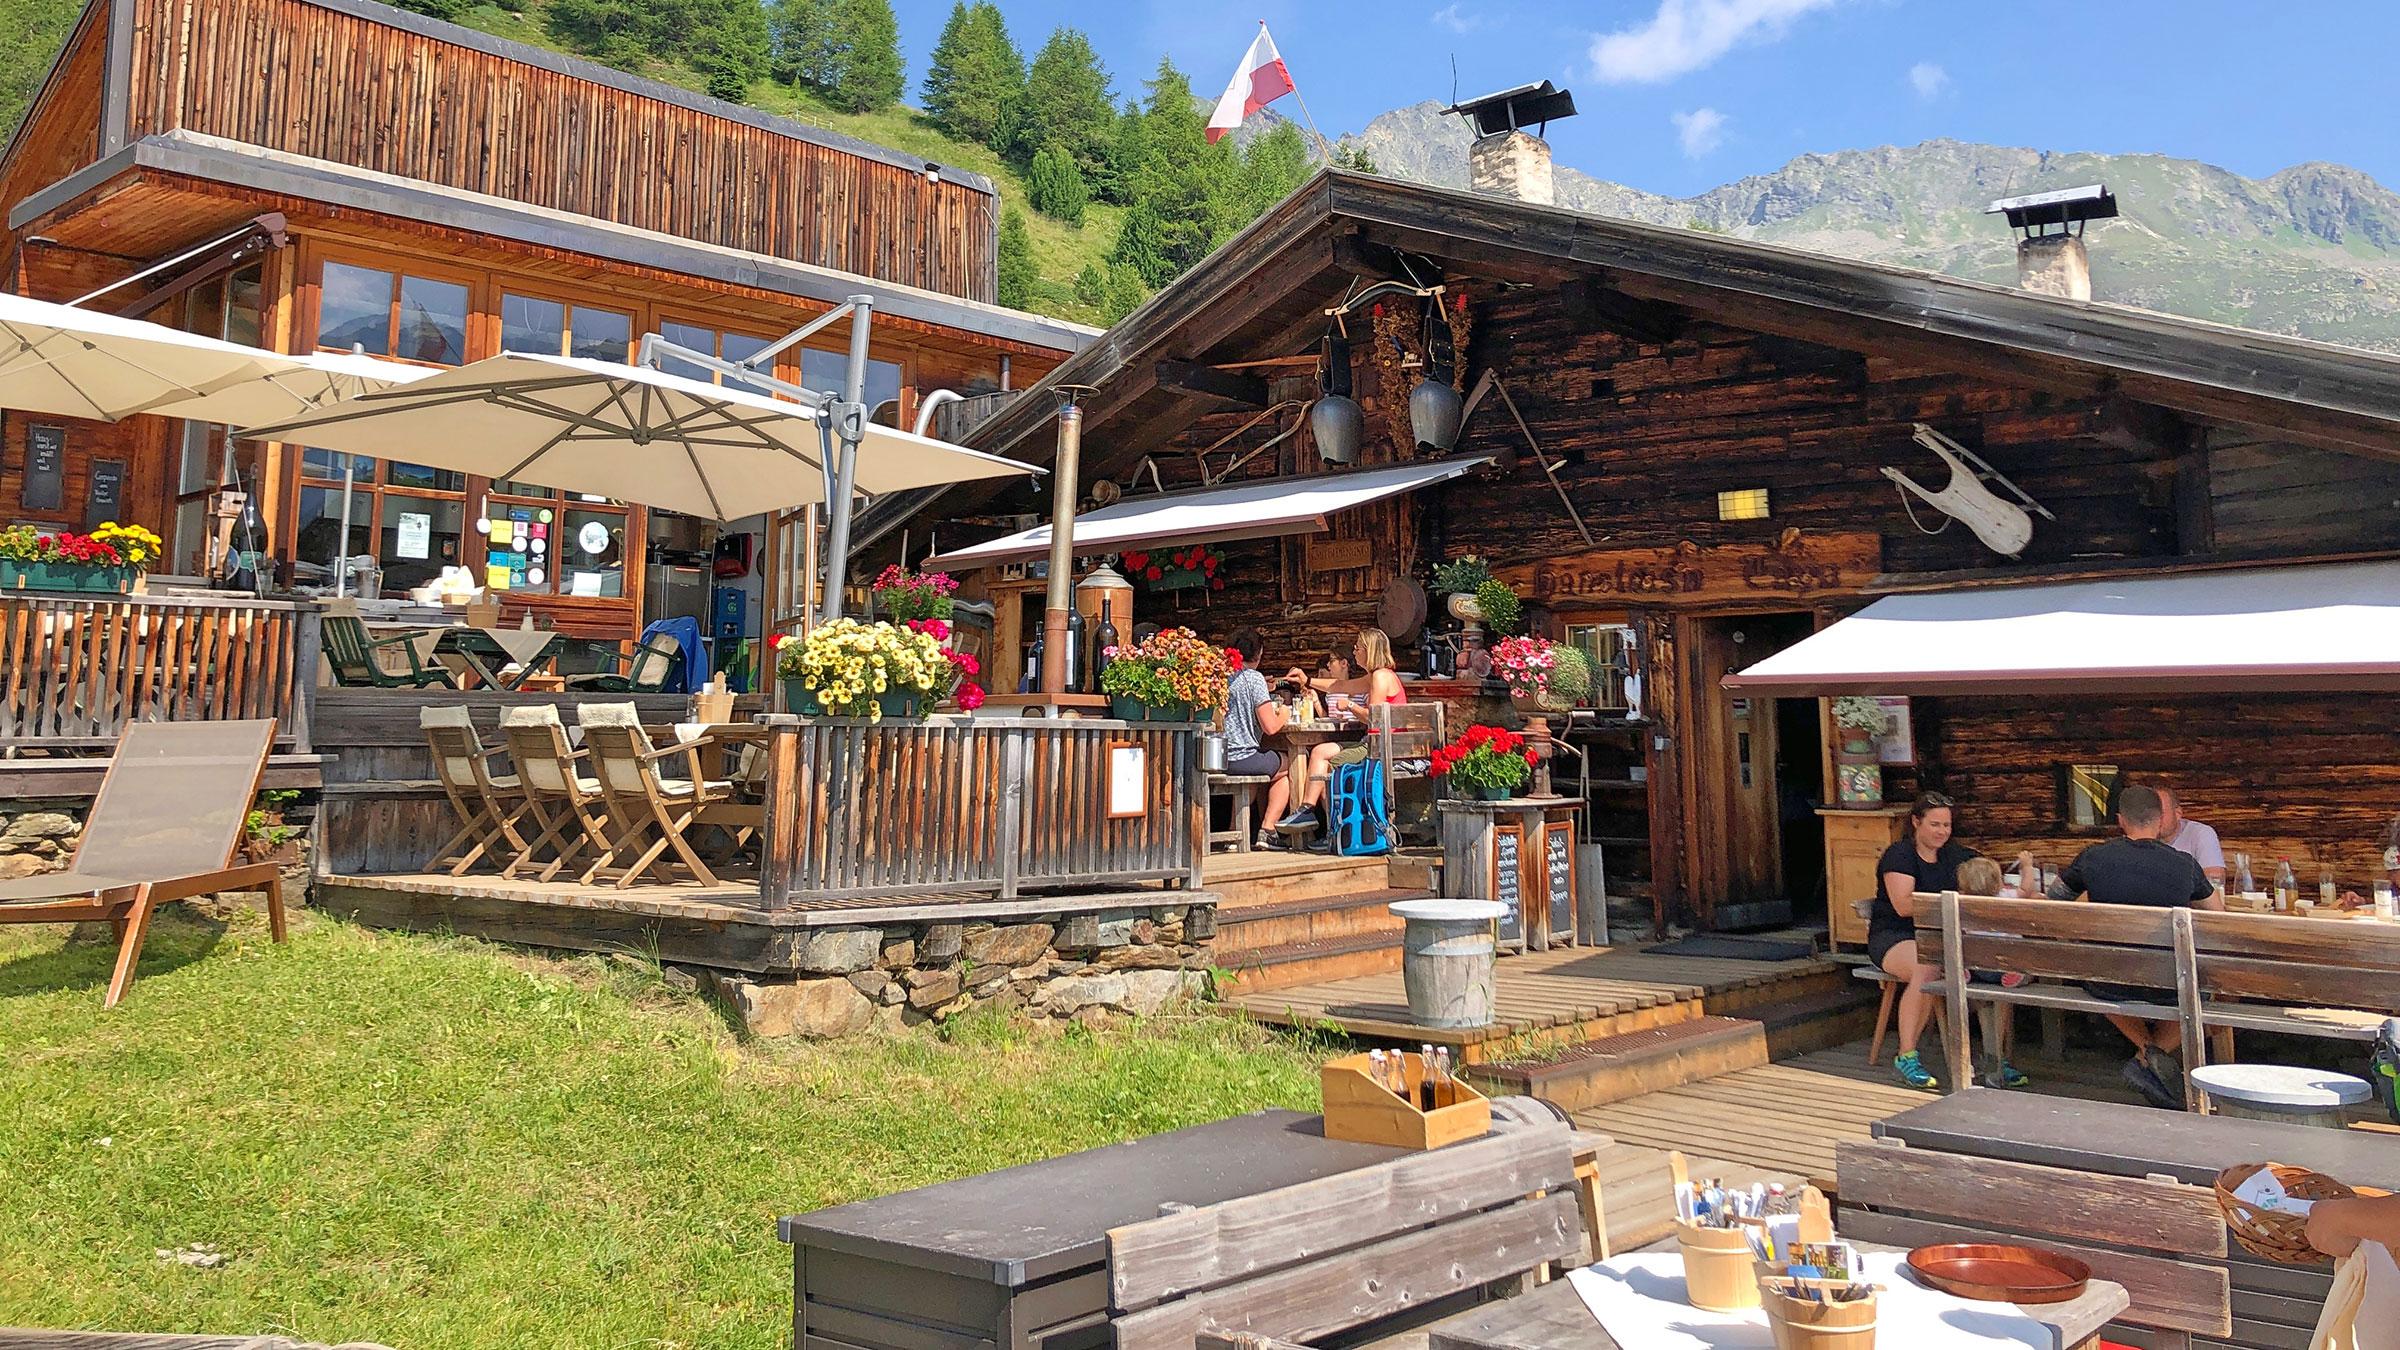 Gampe Thaya Sölden - Familienurlaub Ötztal Tirol